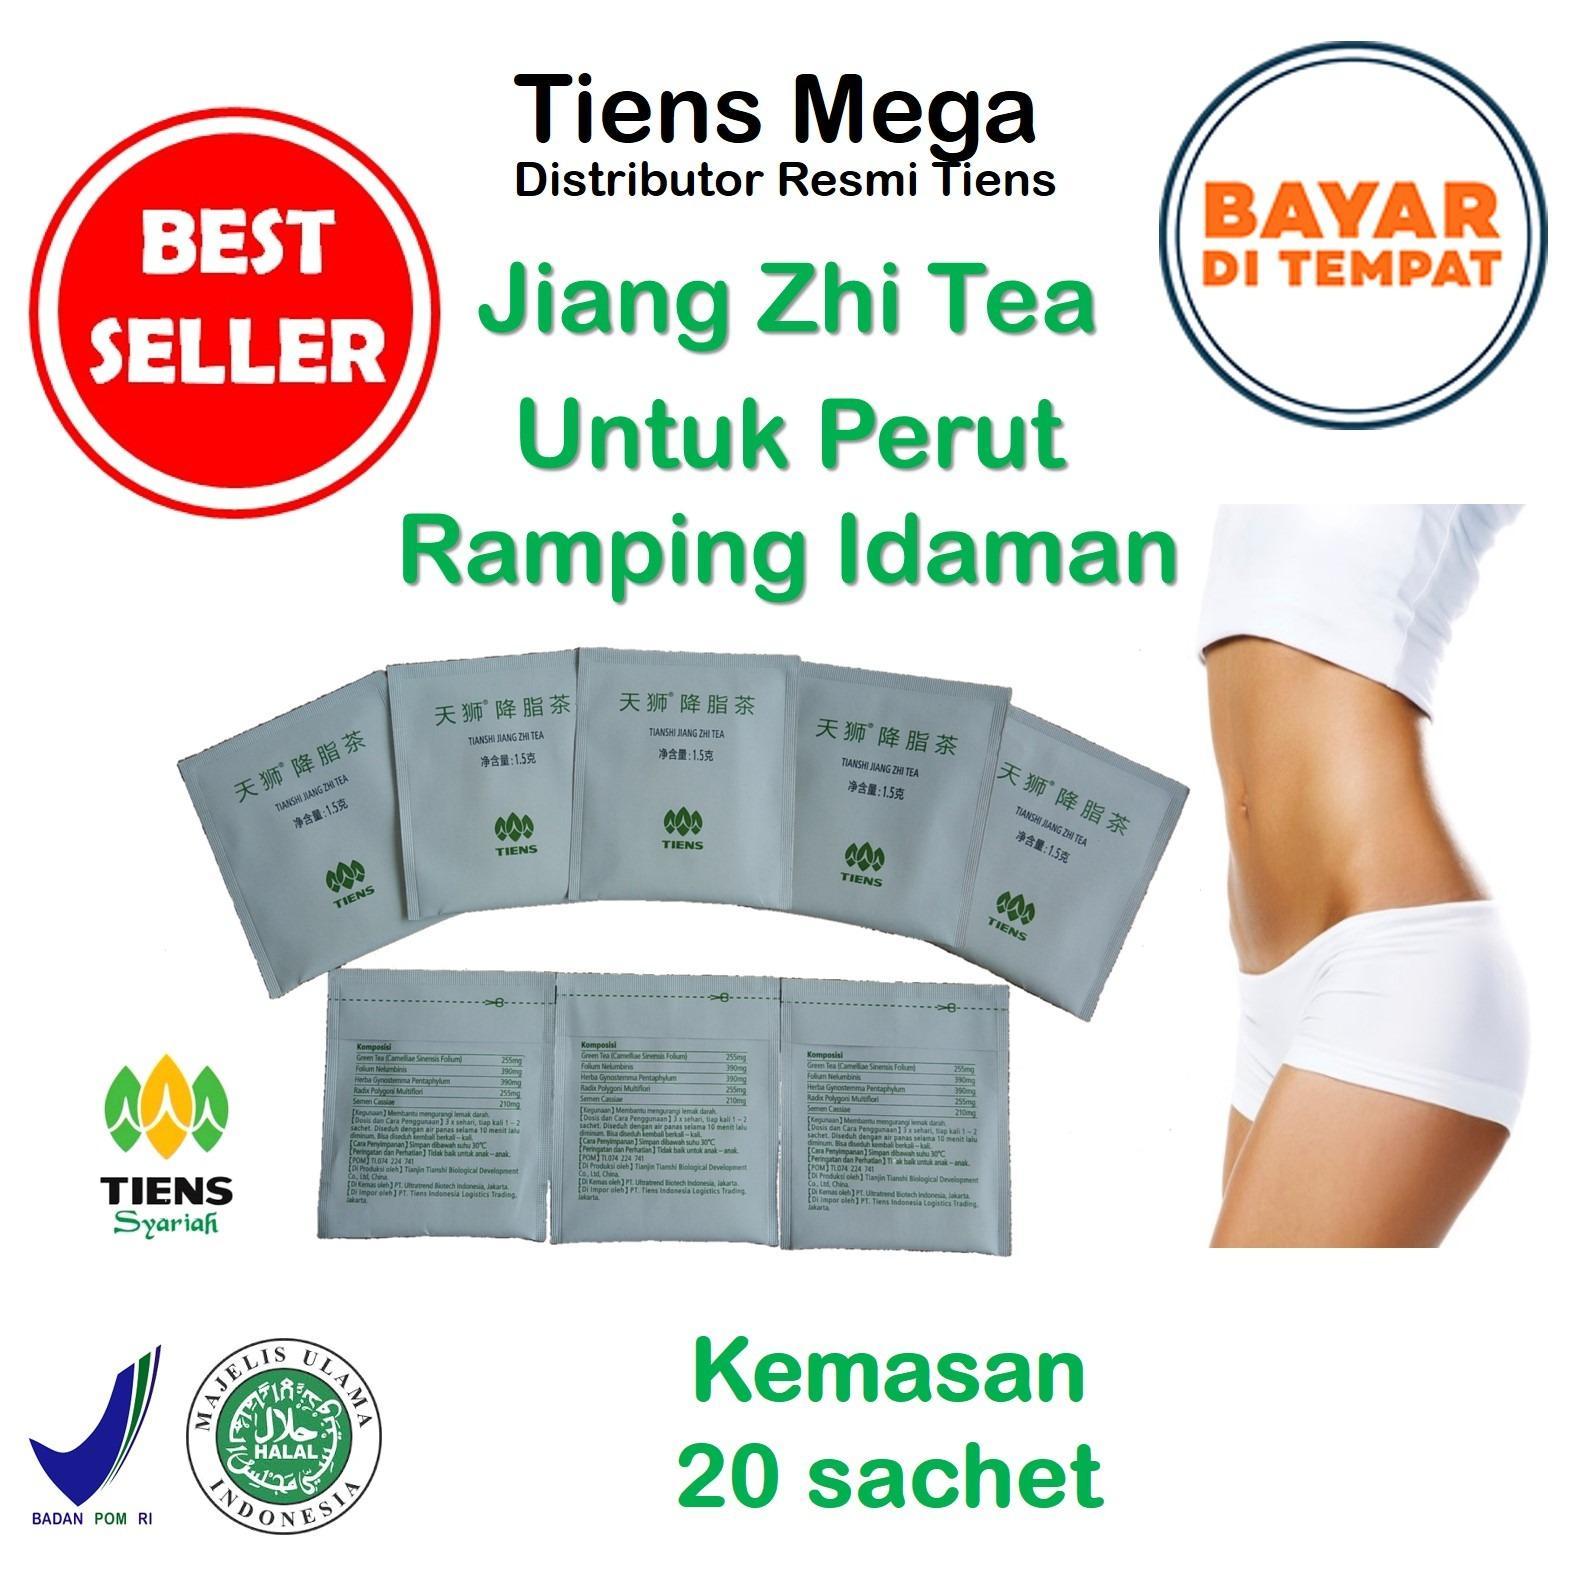 Tiens Teh Pelangsing Jiang Zhi Tea – Paket Promo Banting Harga [20 Sachet] + GRATIS Kartu Diskon Tiens  Mega